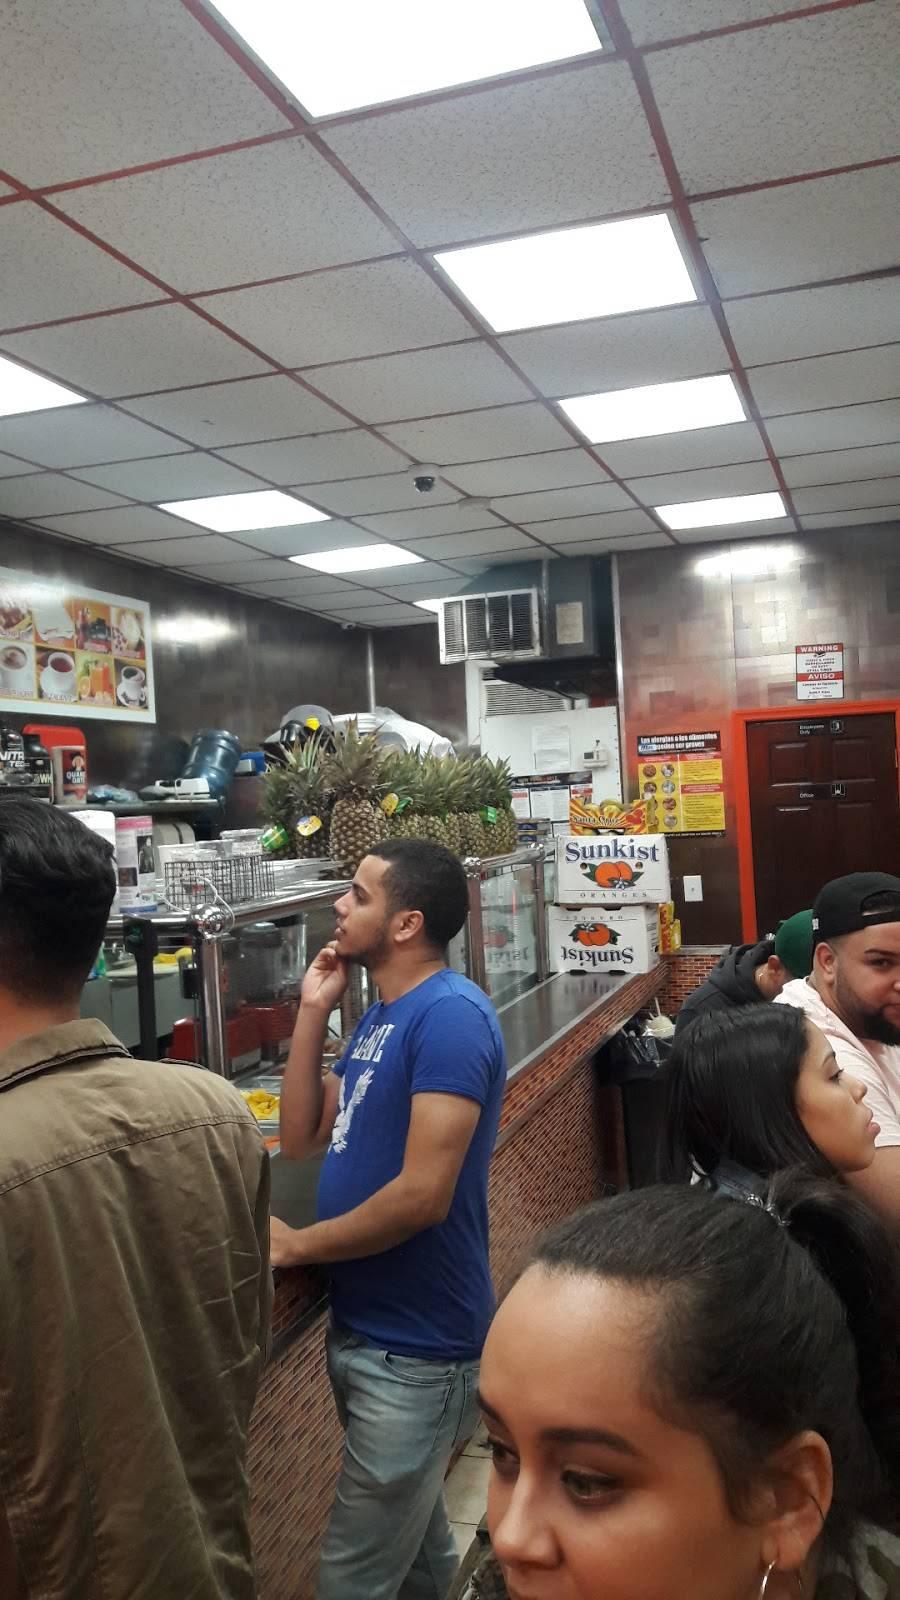 Empanadas Monumental   restaurant   522 W 207th St, New York, NY 10034, USA   2125675241 OR +1 212-567-5241